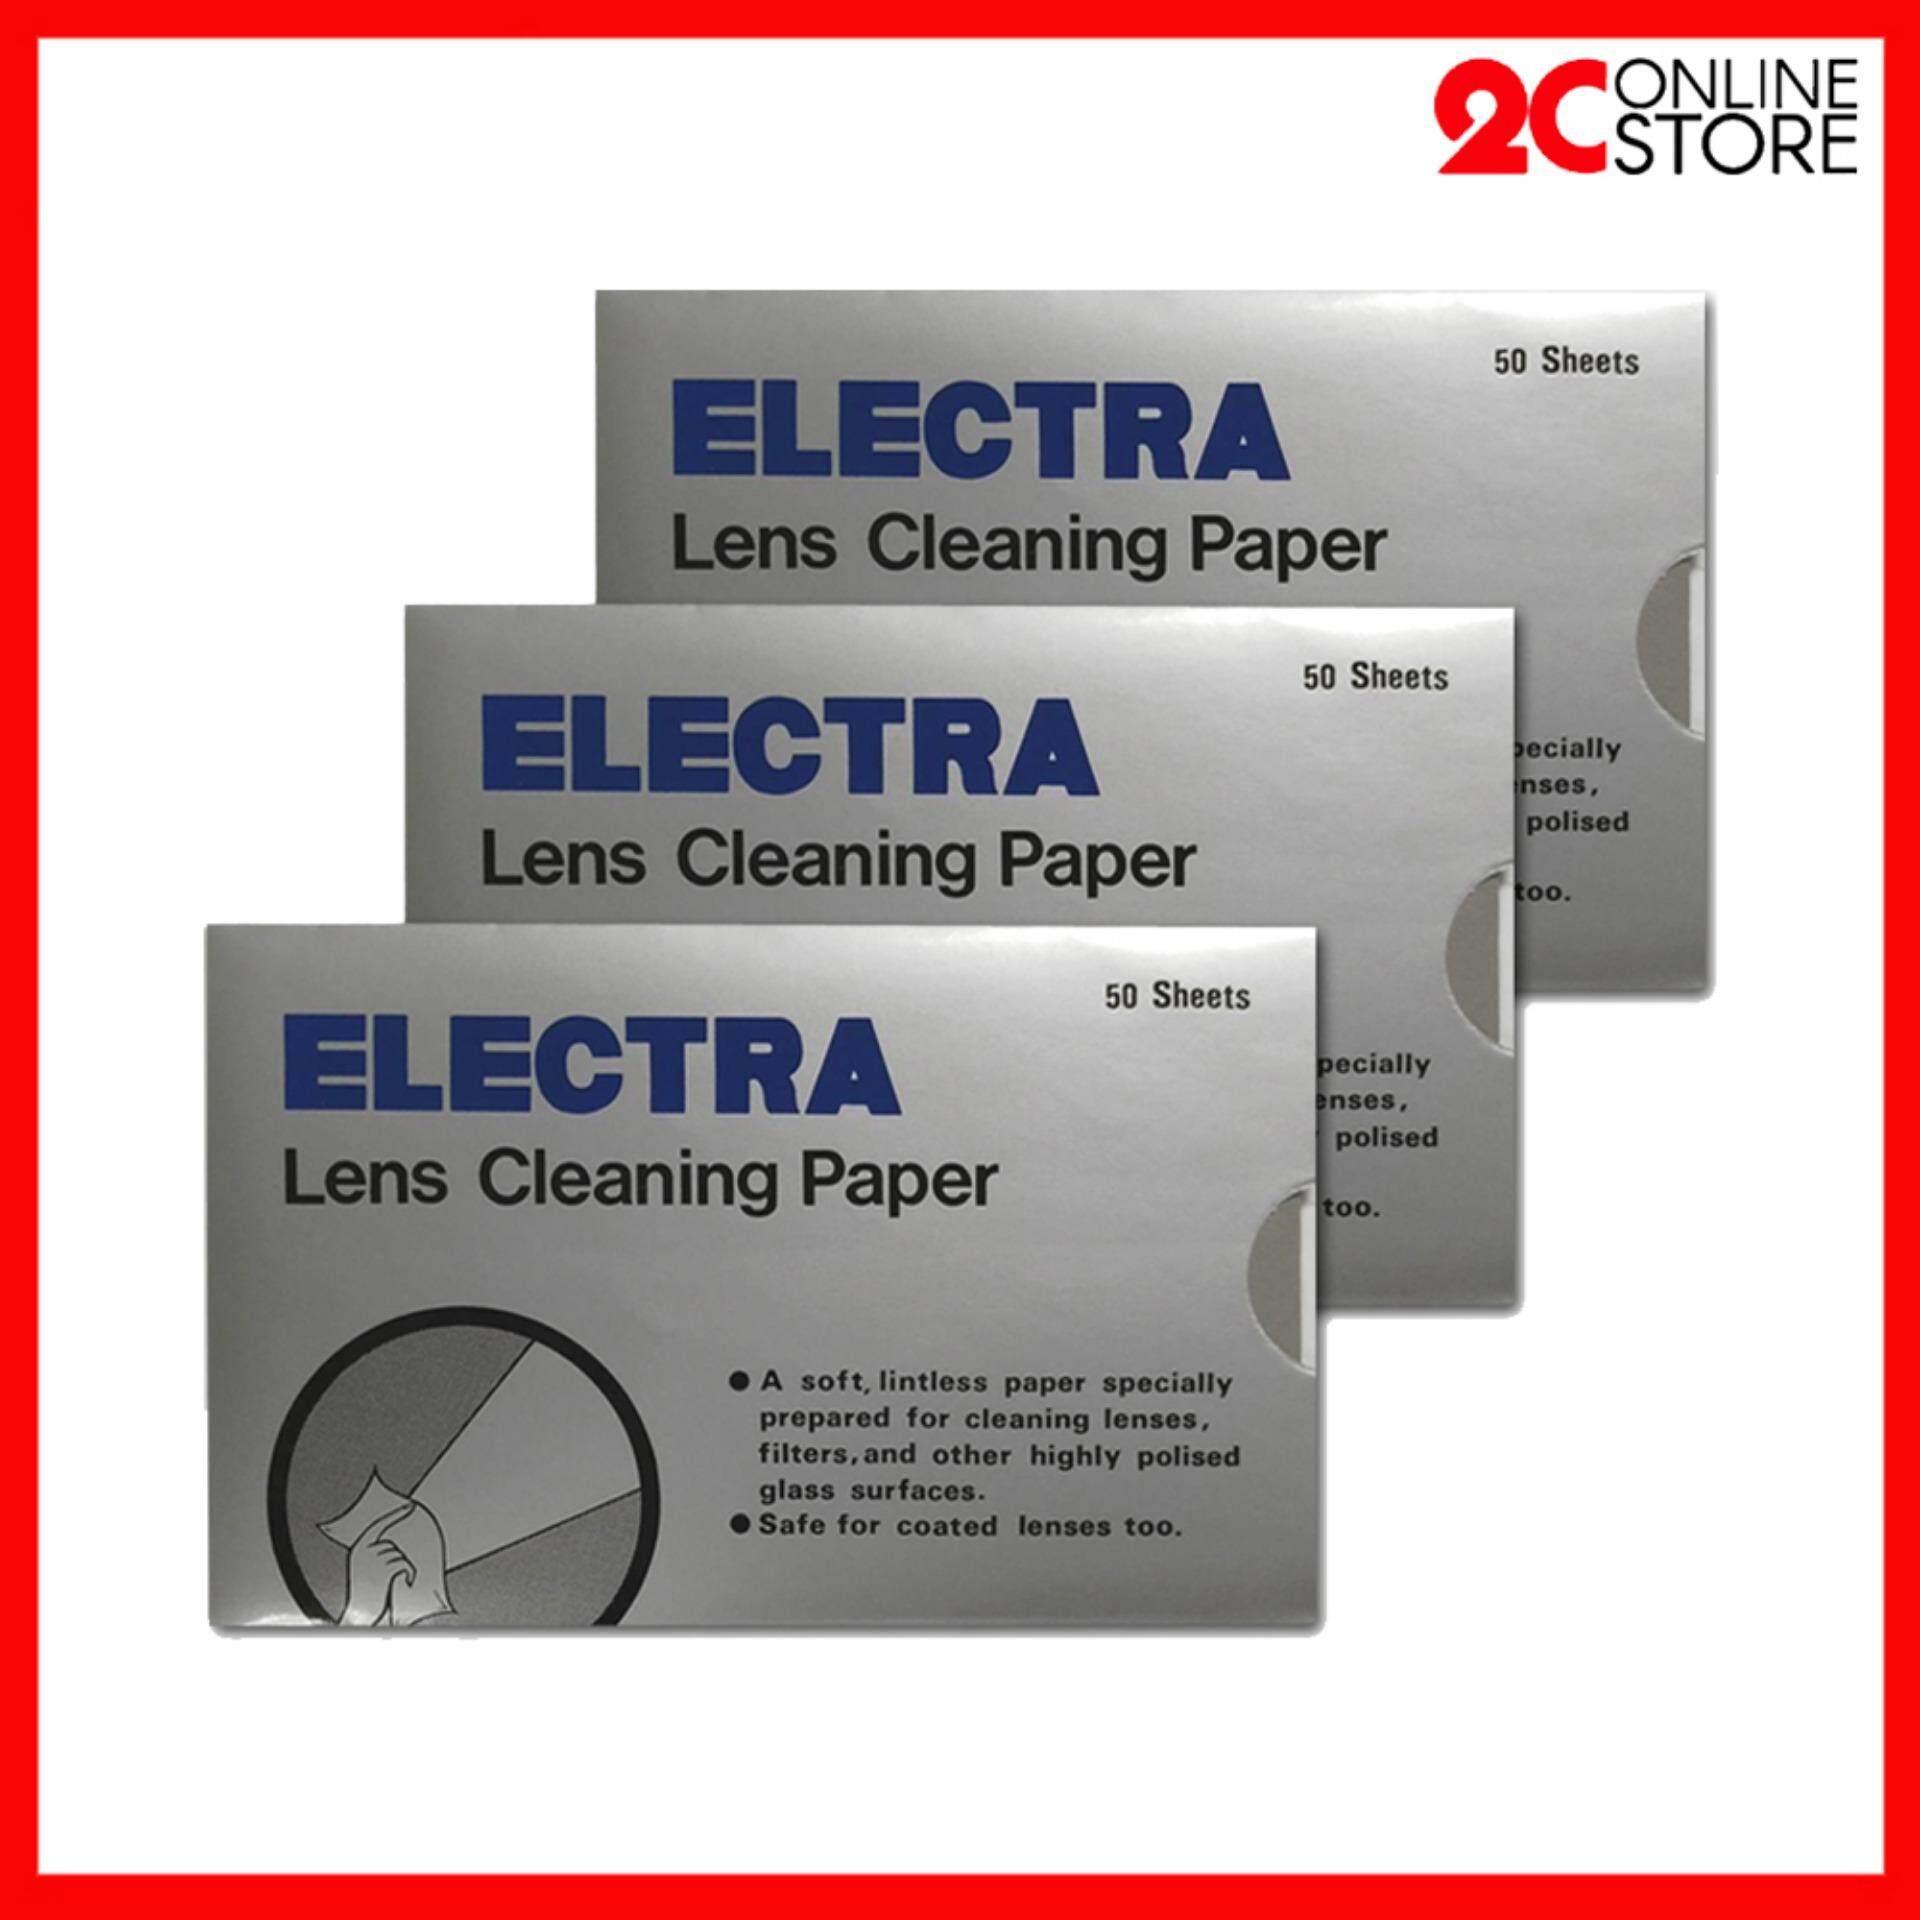 Electra Lens Cleaning Paper (3 Pack) กระดาษเช็ดเลนส์